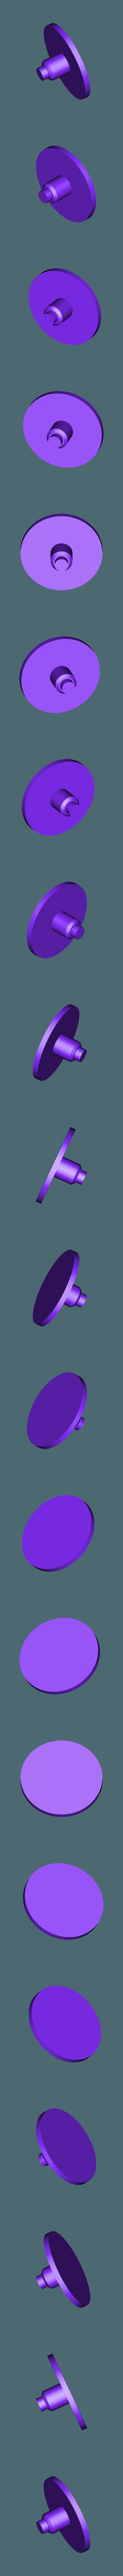 dreadnought-handle2.stl Download free STL file Dreadnought Fidget Spinner • 3D print object, ProteanMan